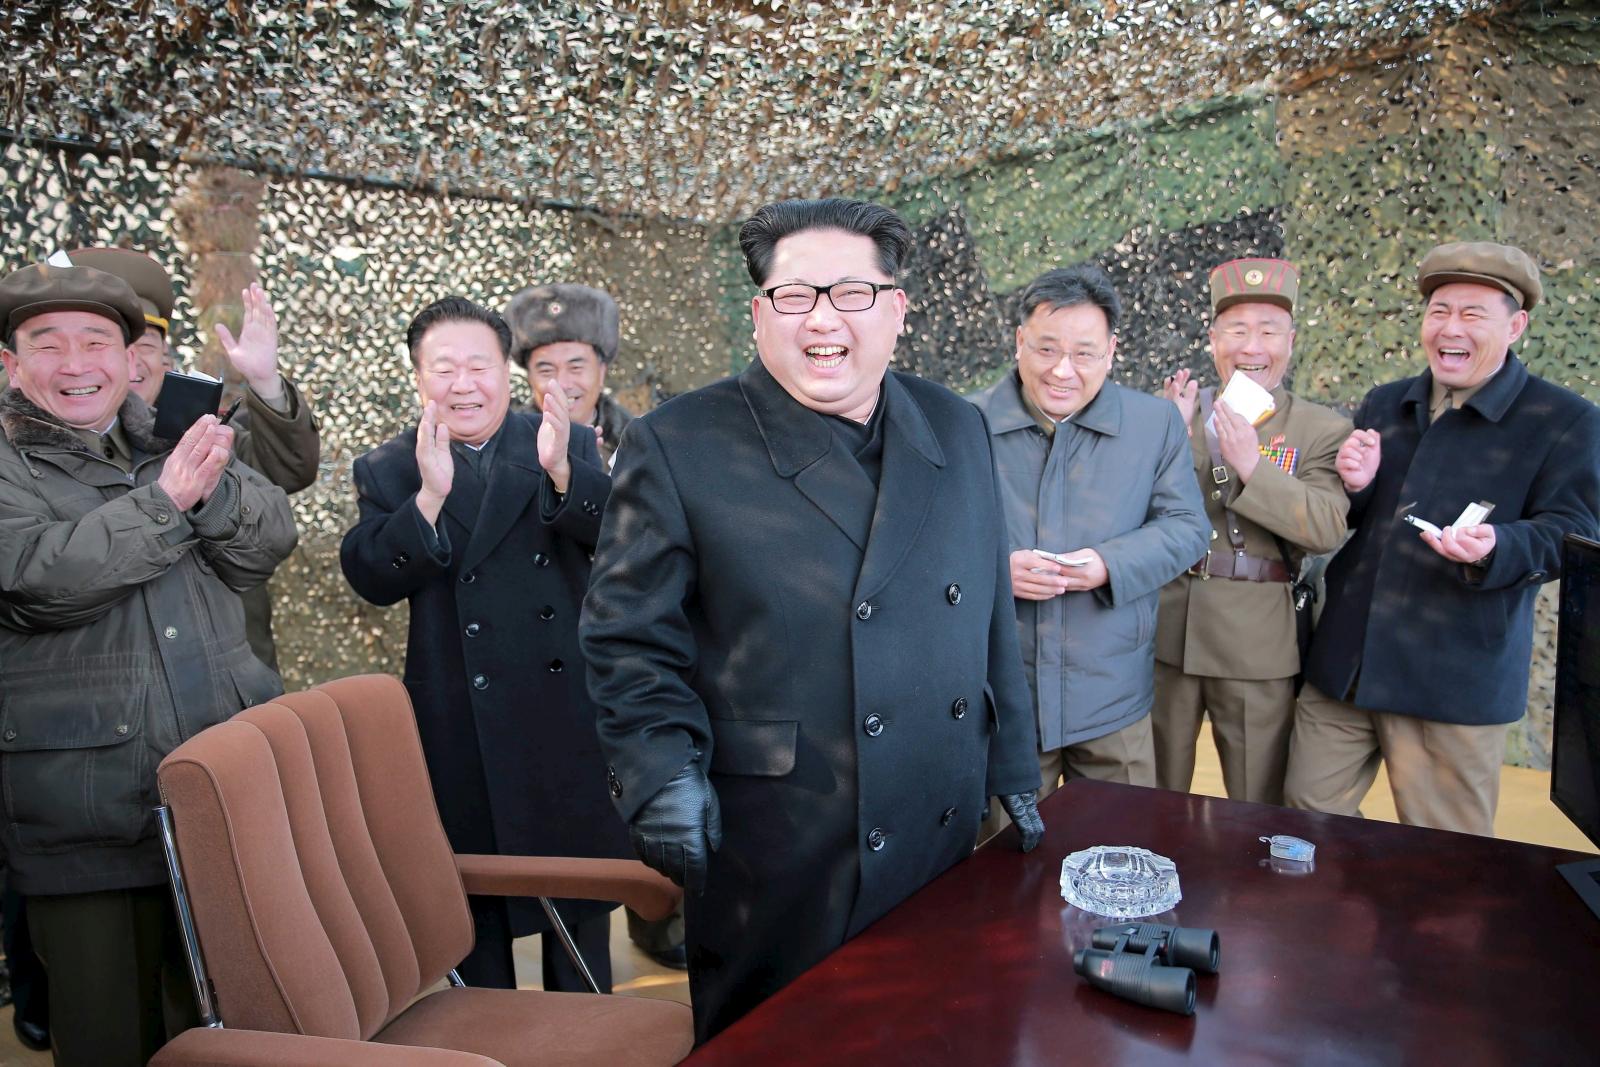 USA at United Nations table on China importing North Korean coal, ore